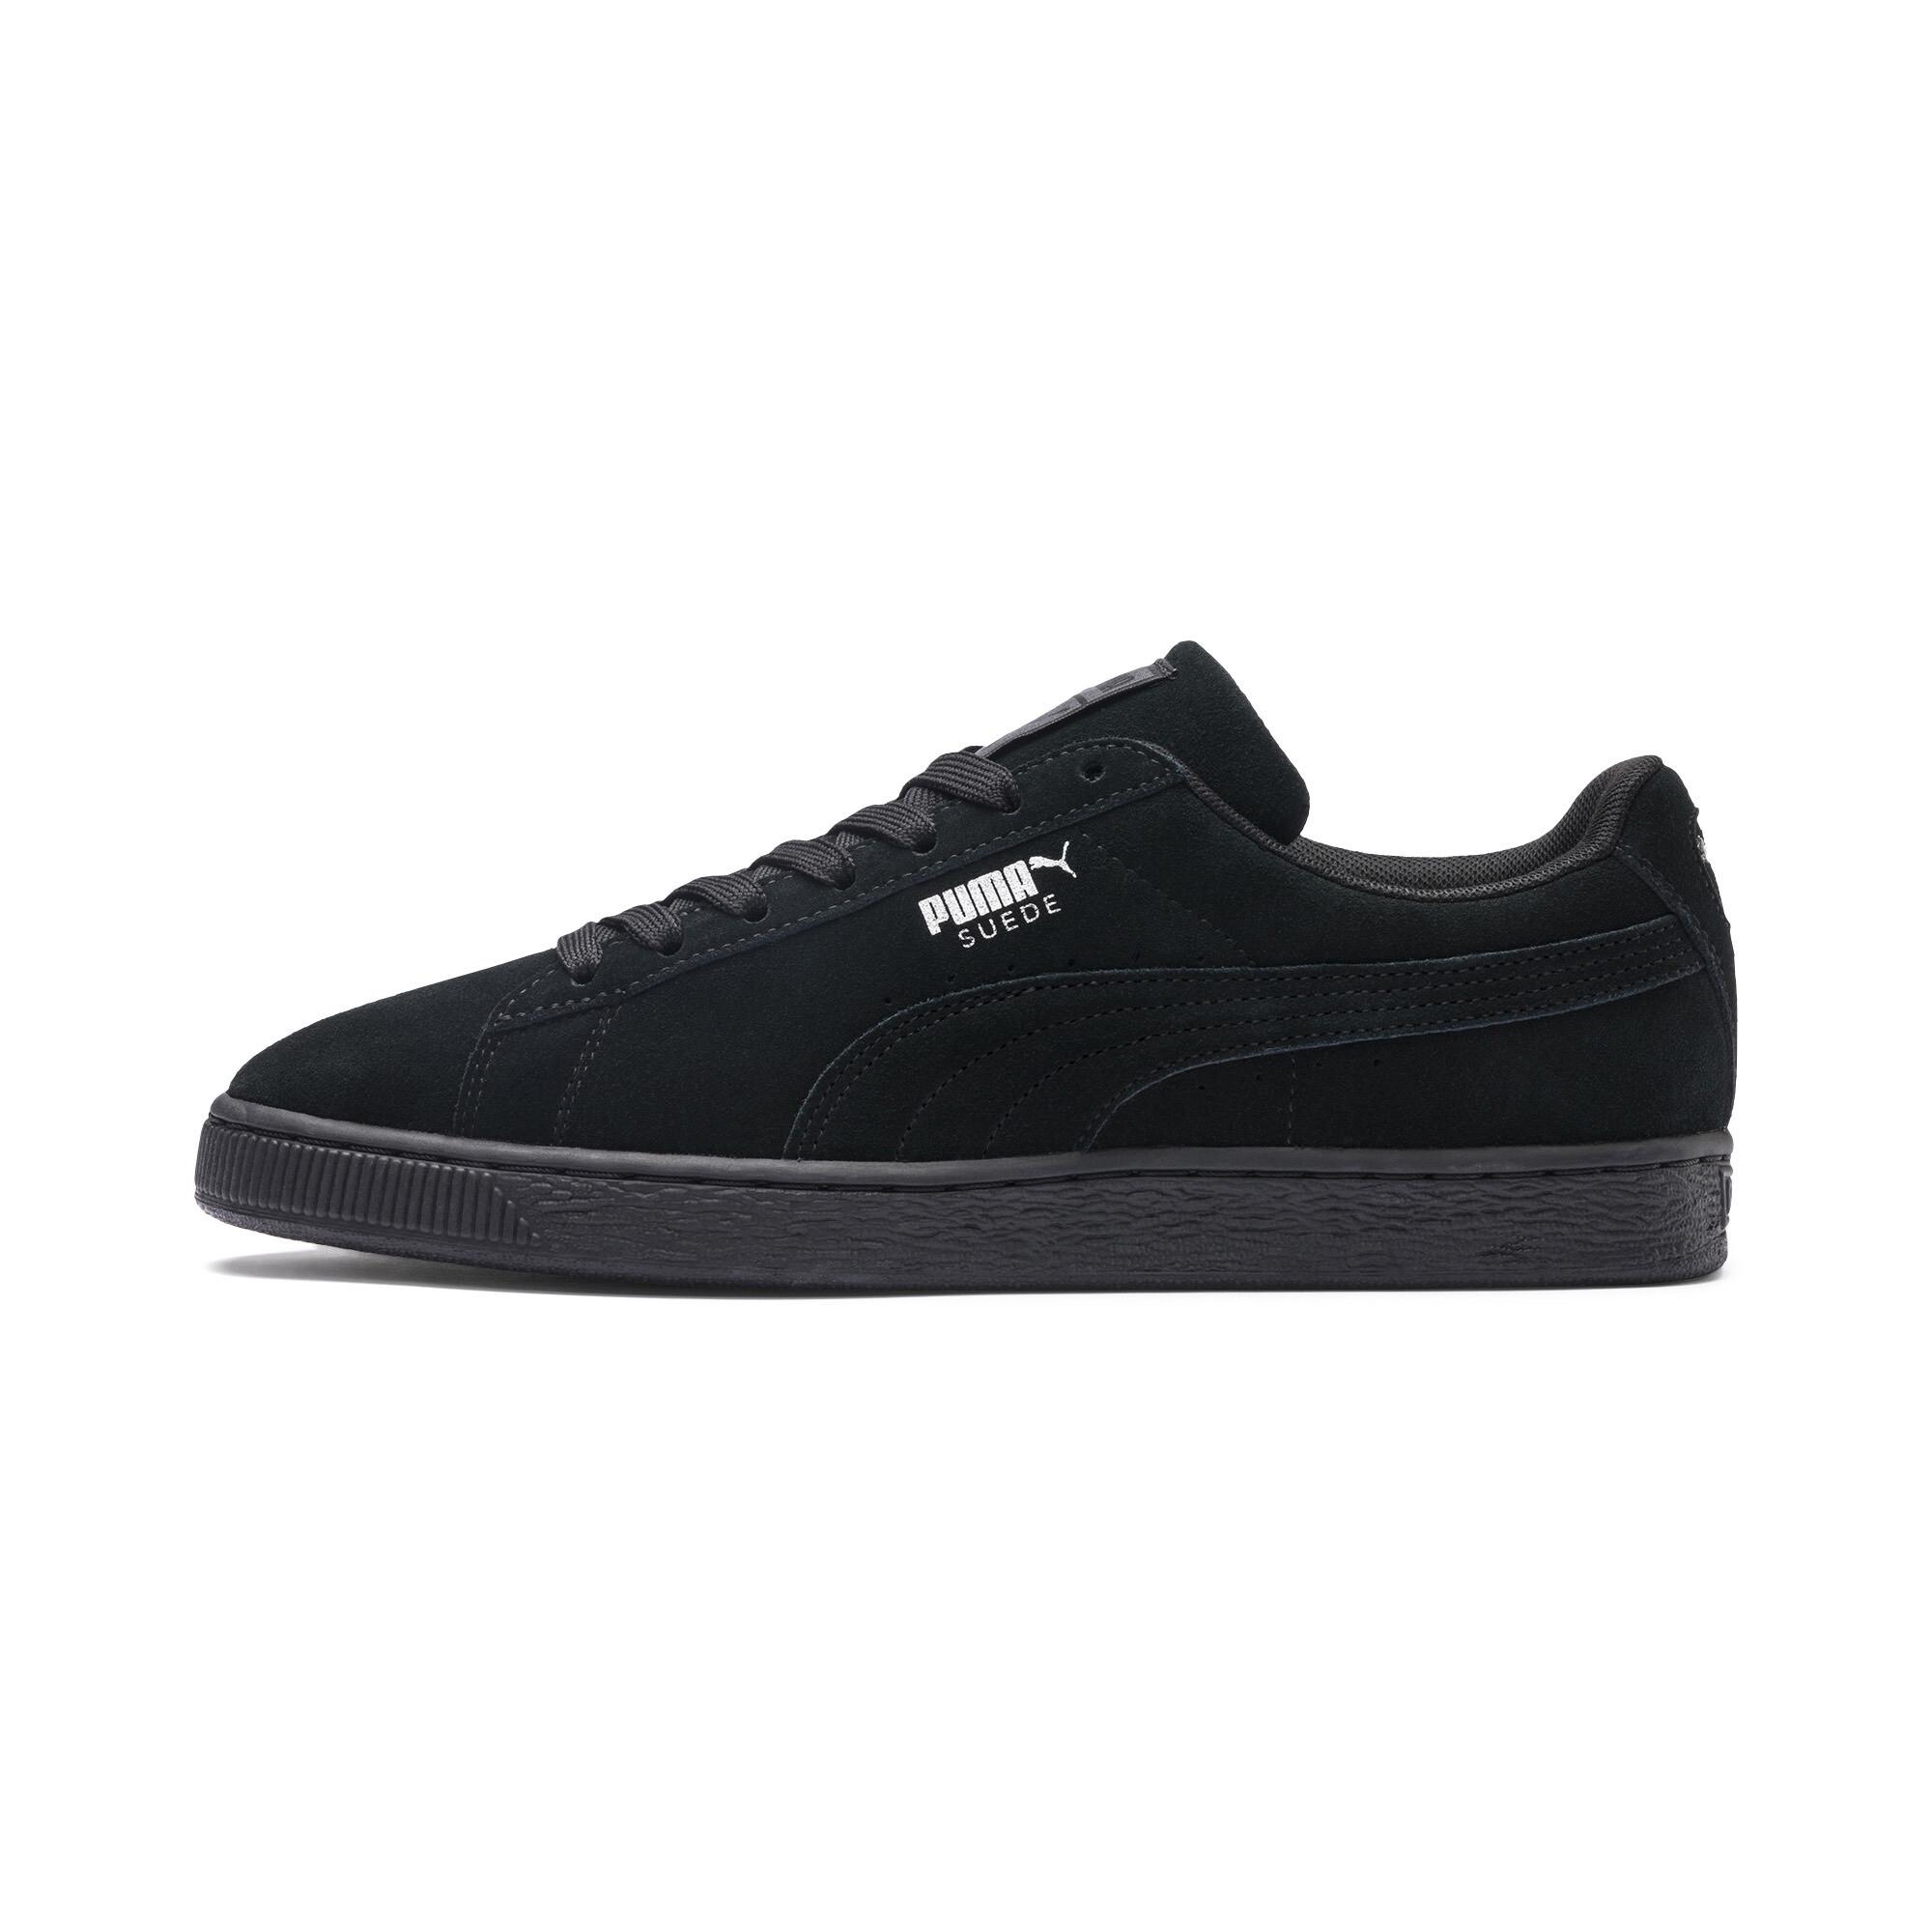 PUMA-Suede-Classic-Sneakers-Men-Shoe-Sport-Shoe thumbnail 4